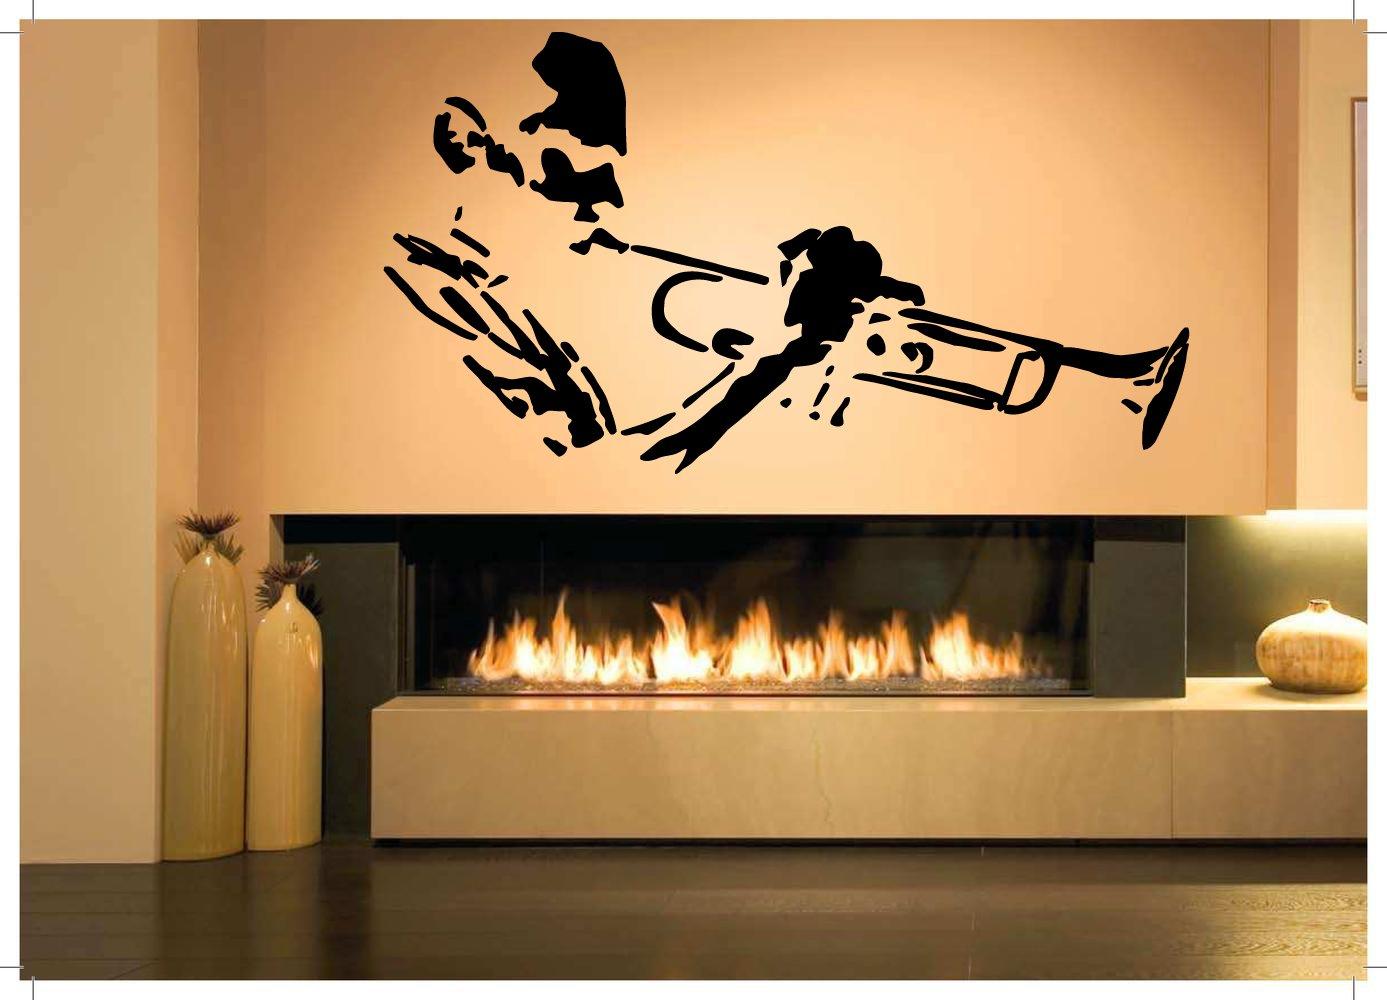 Amazon.com: Wall Room Decor Art Vinyl Decal Sticker Trombone Trumpet ...